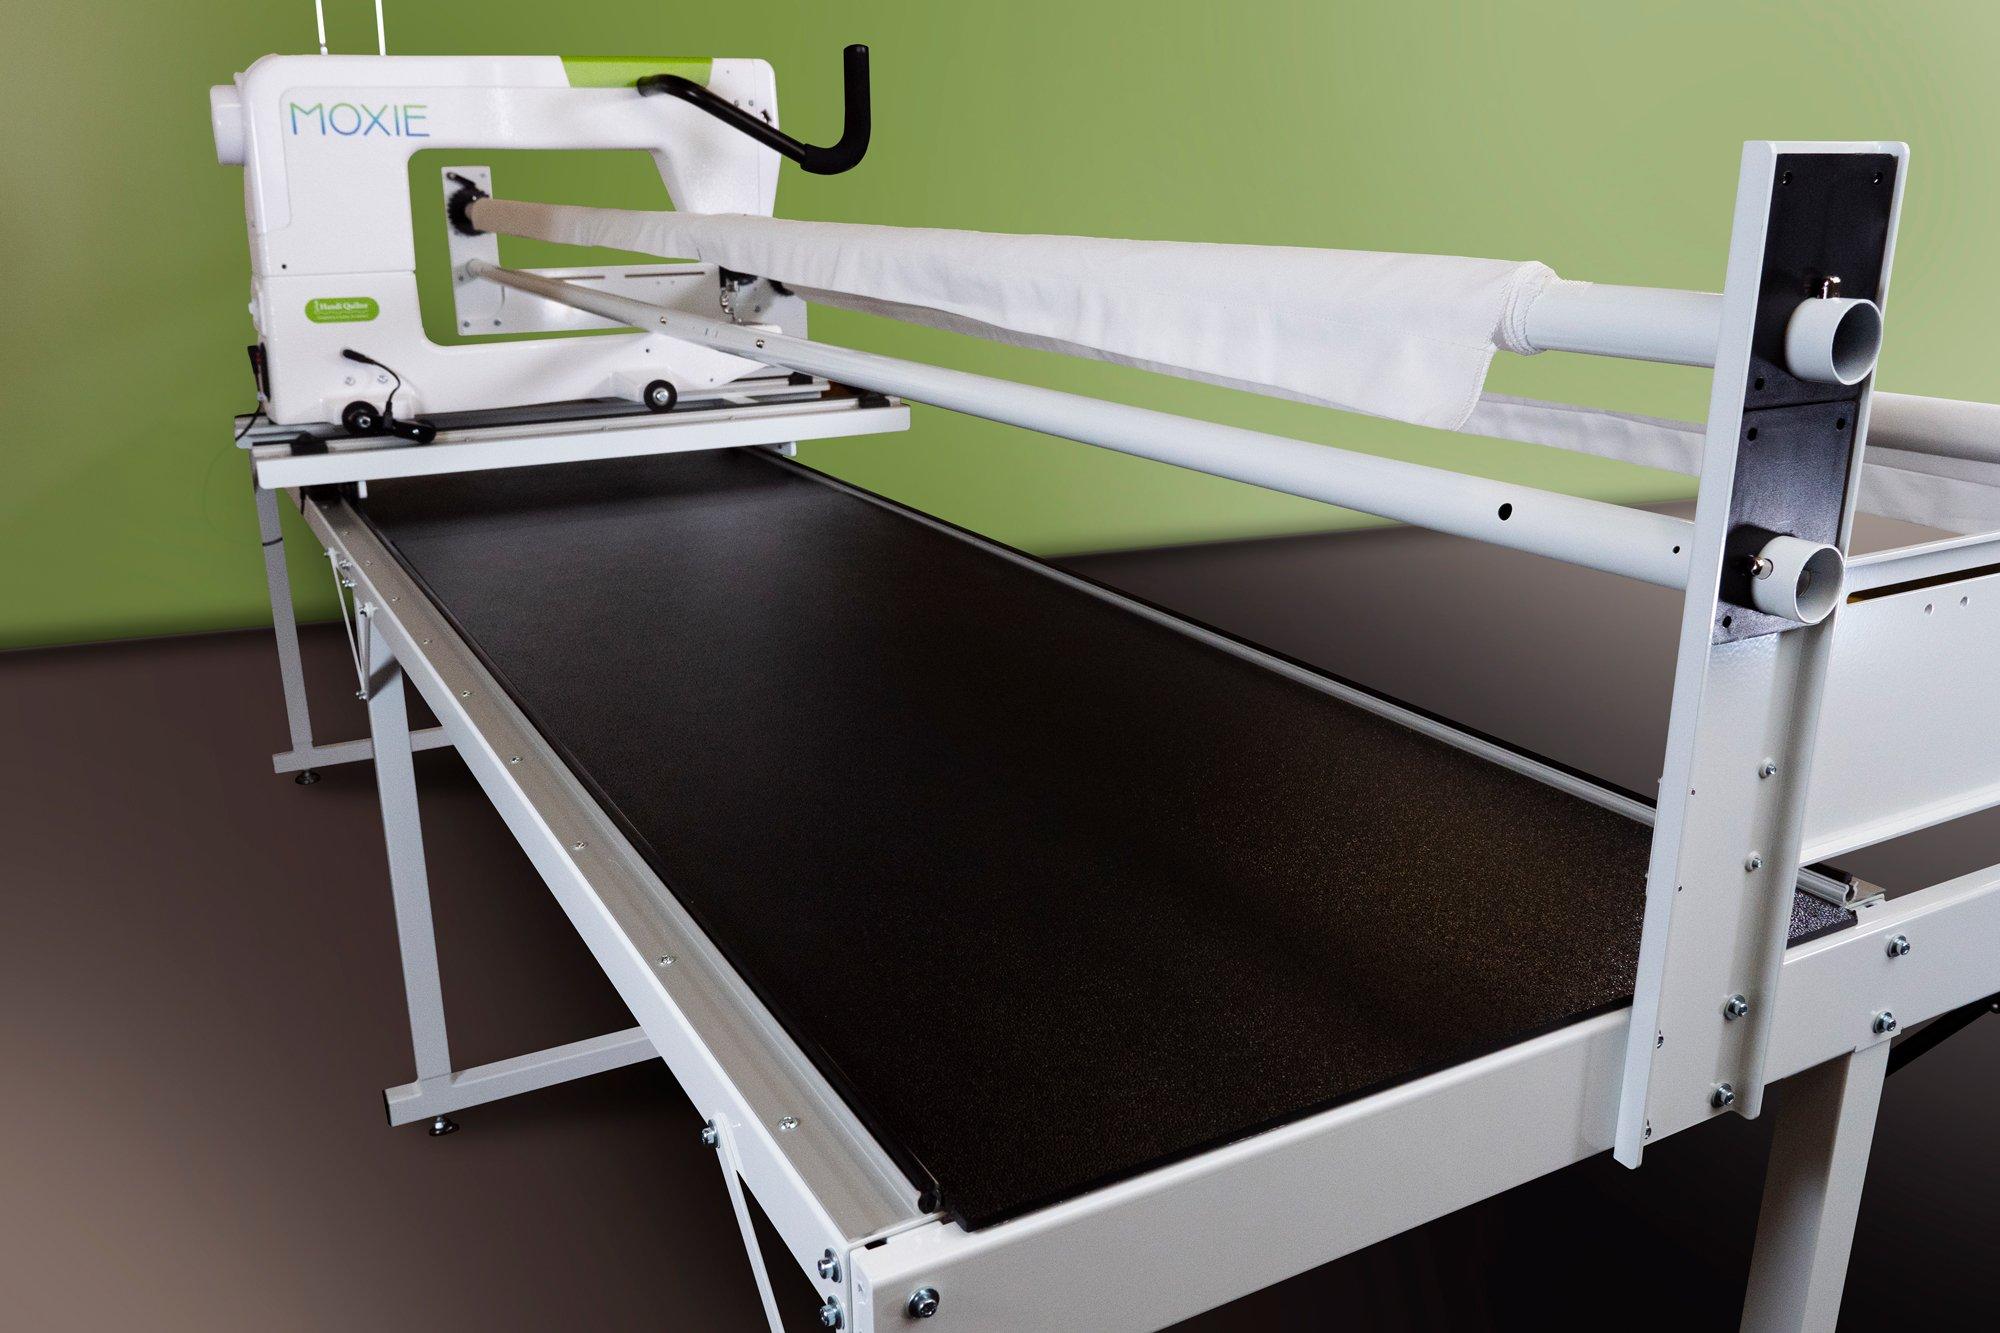 8-Foot Loft Frame Table Top Kit